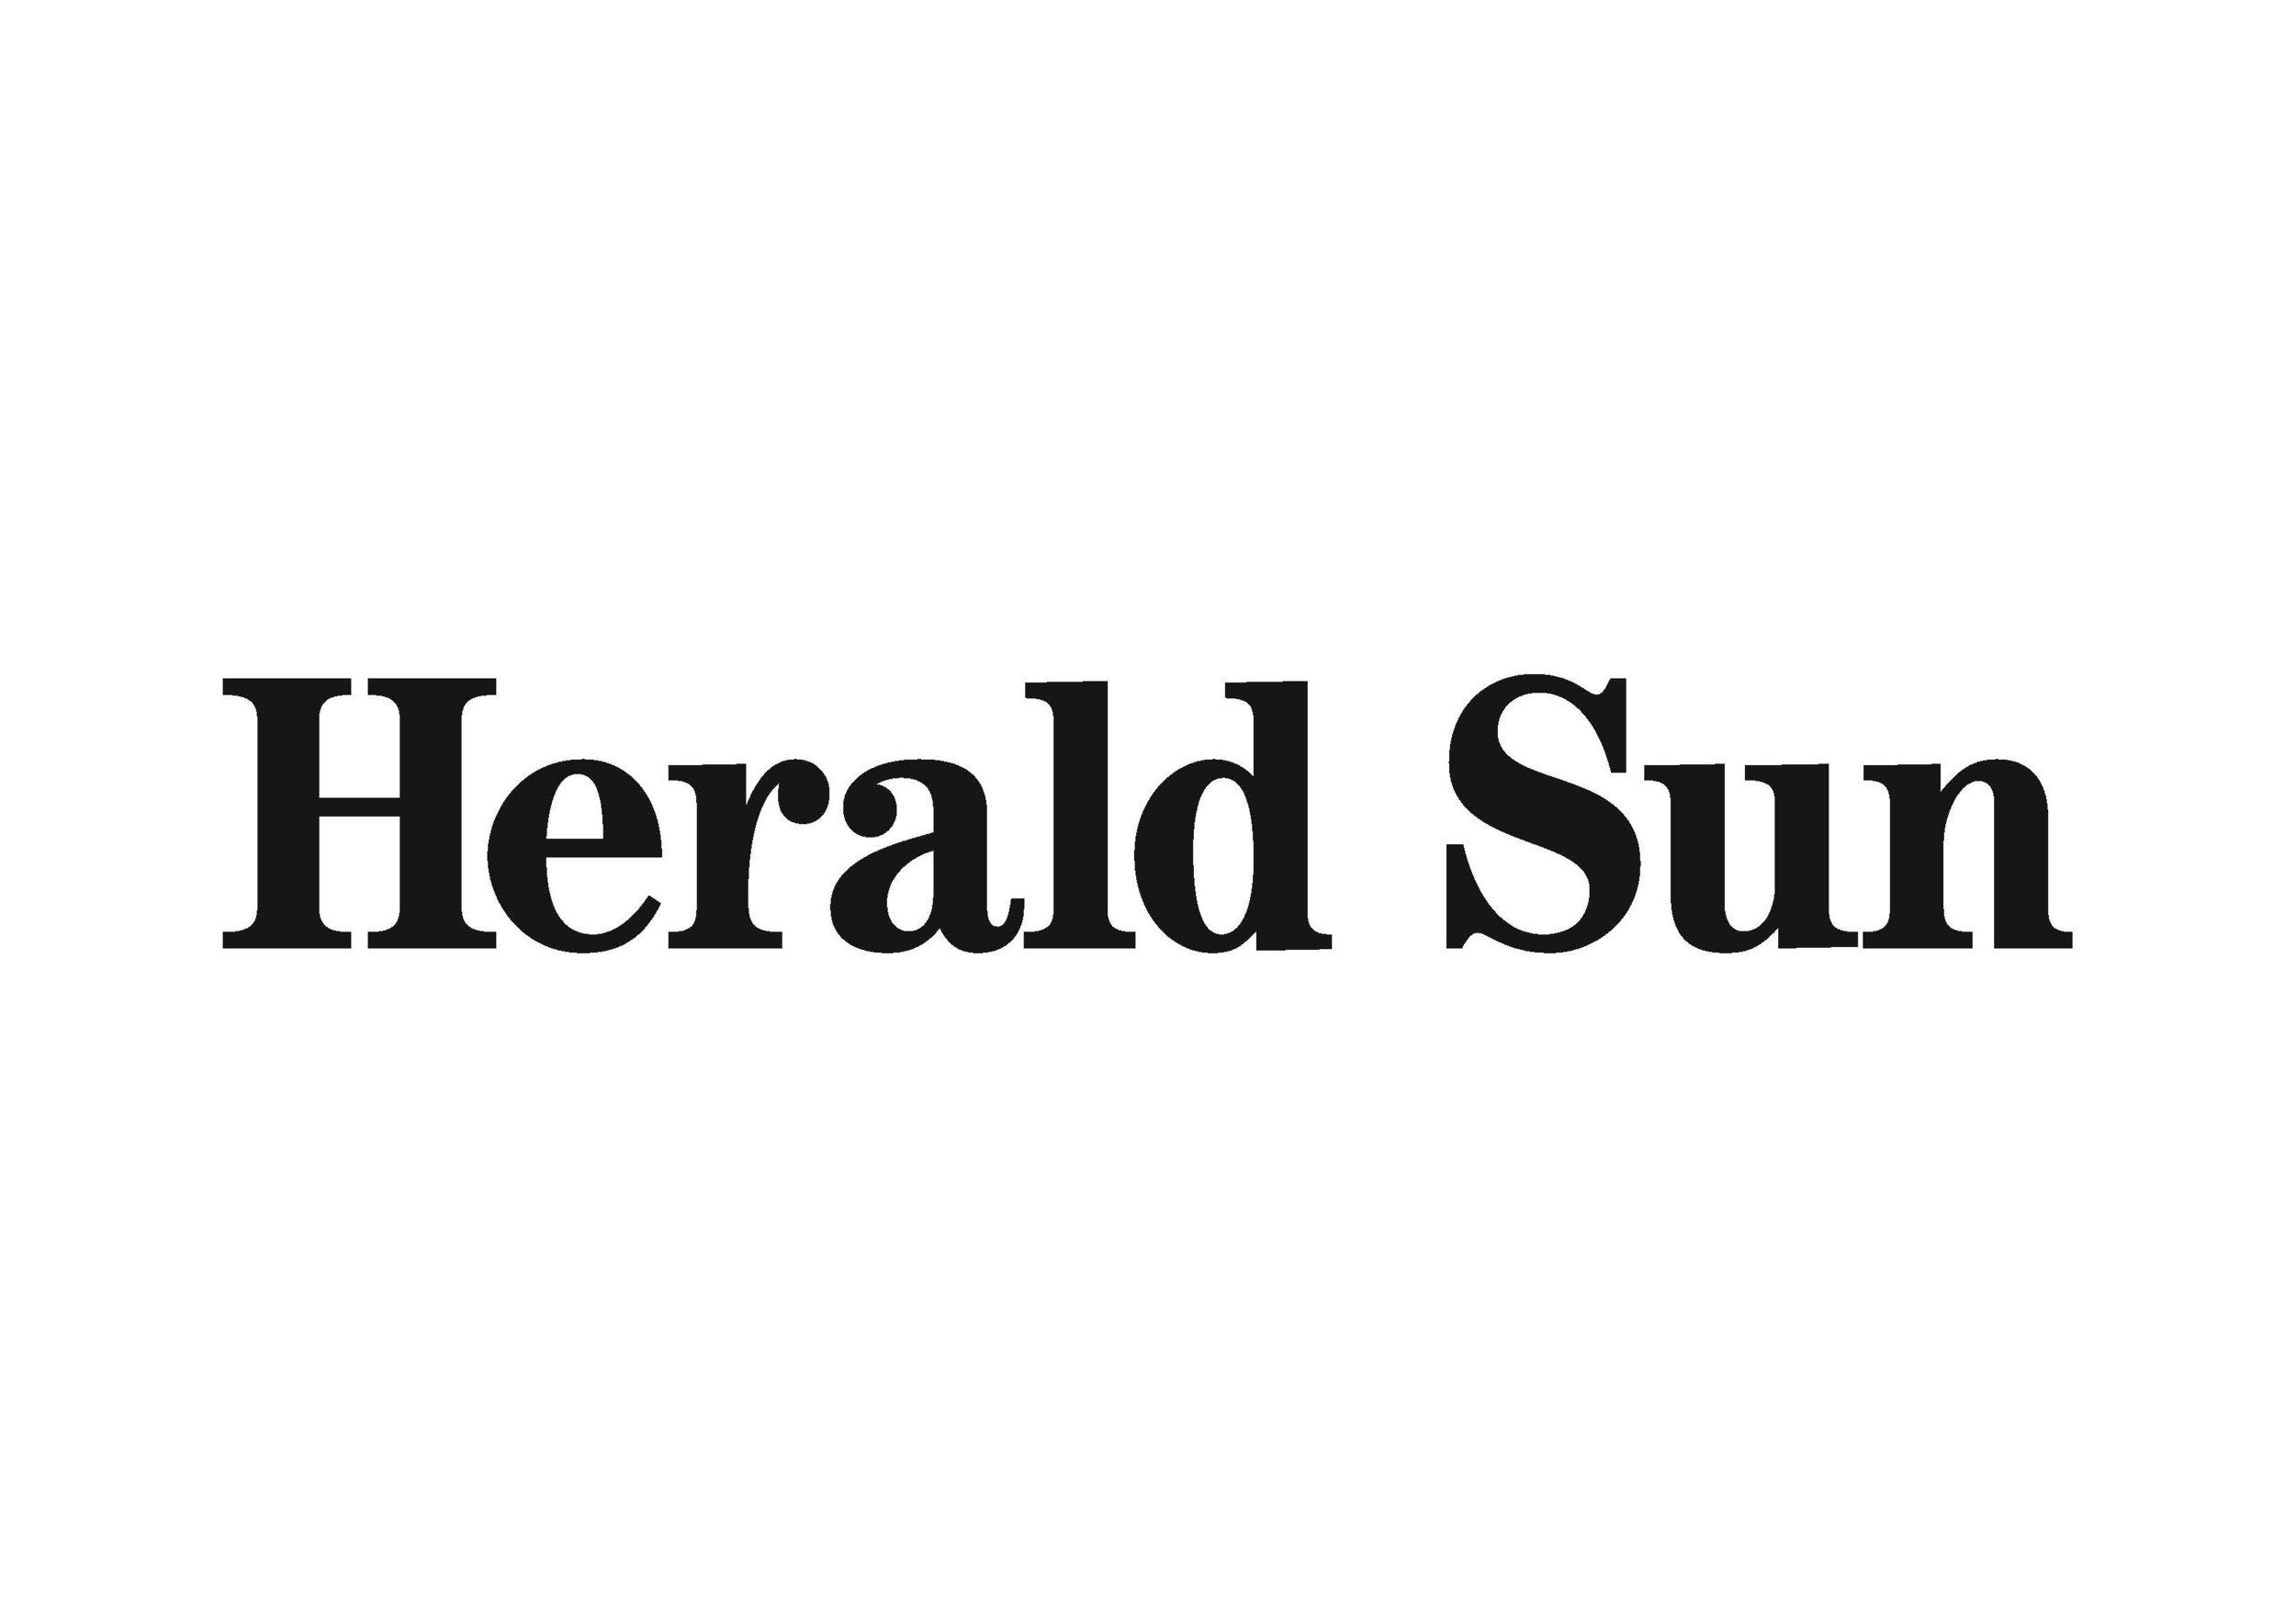 Herald-Sun-Masthead-Logo.jpg